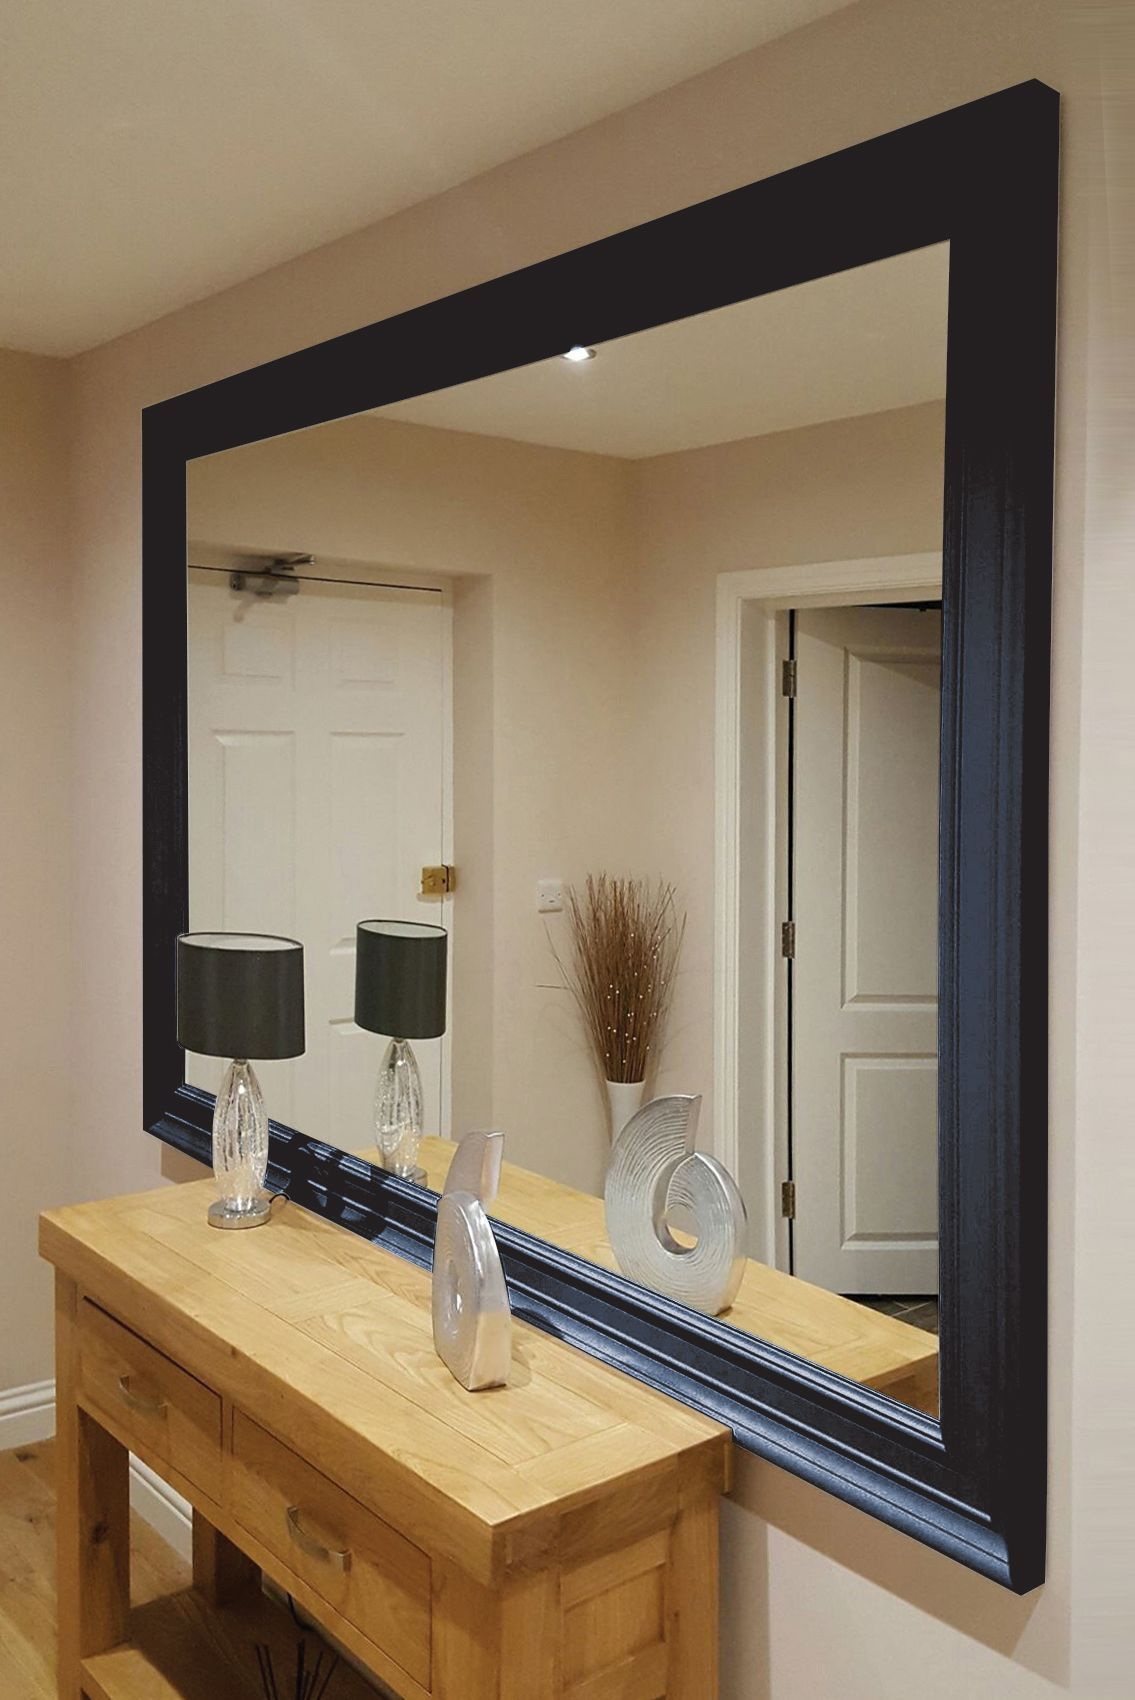 Large Contemporary Black Wall Mirror 206x145cm Shop Contemporary Black Mirror